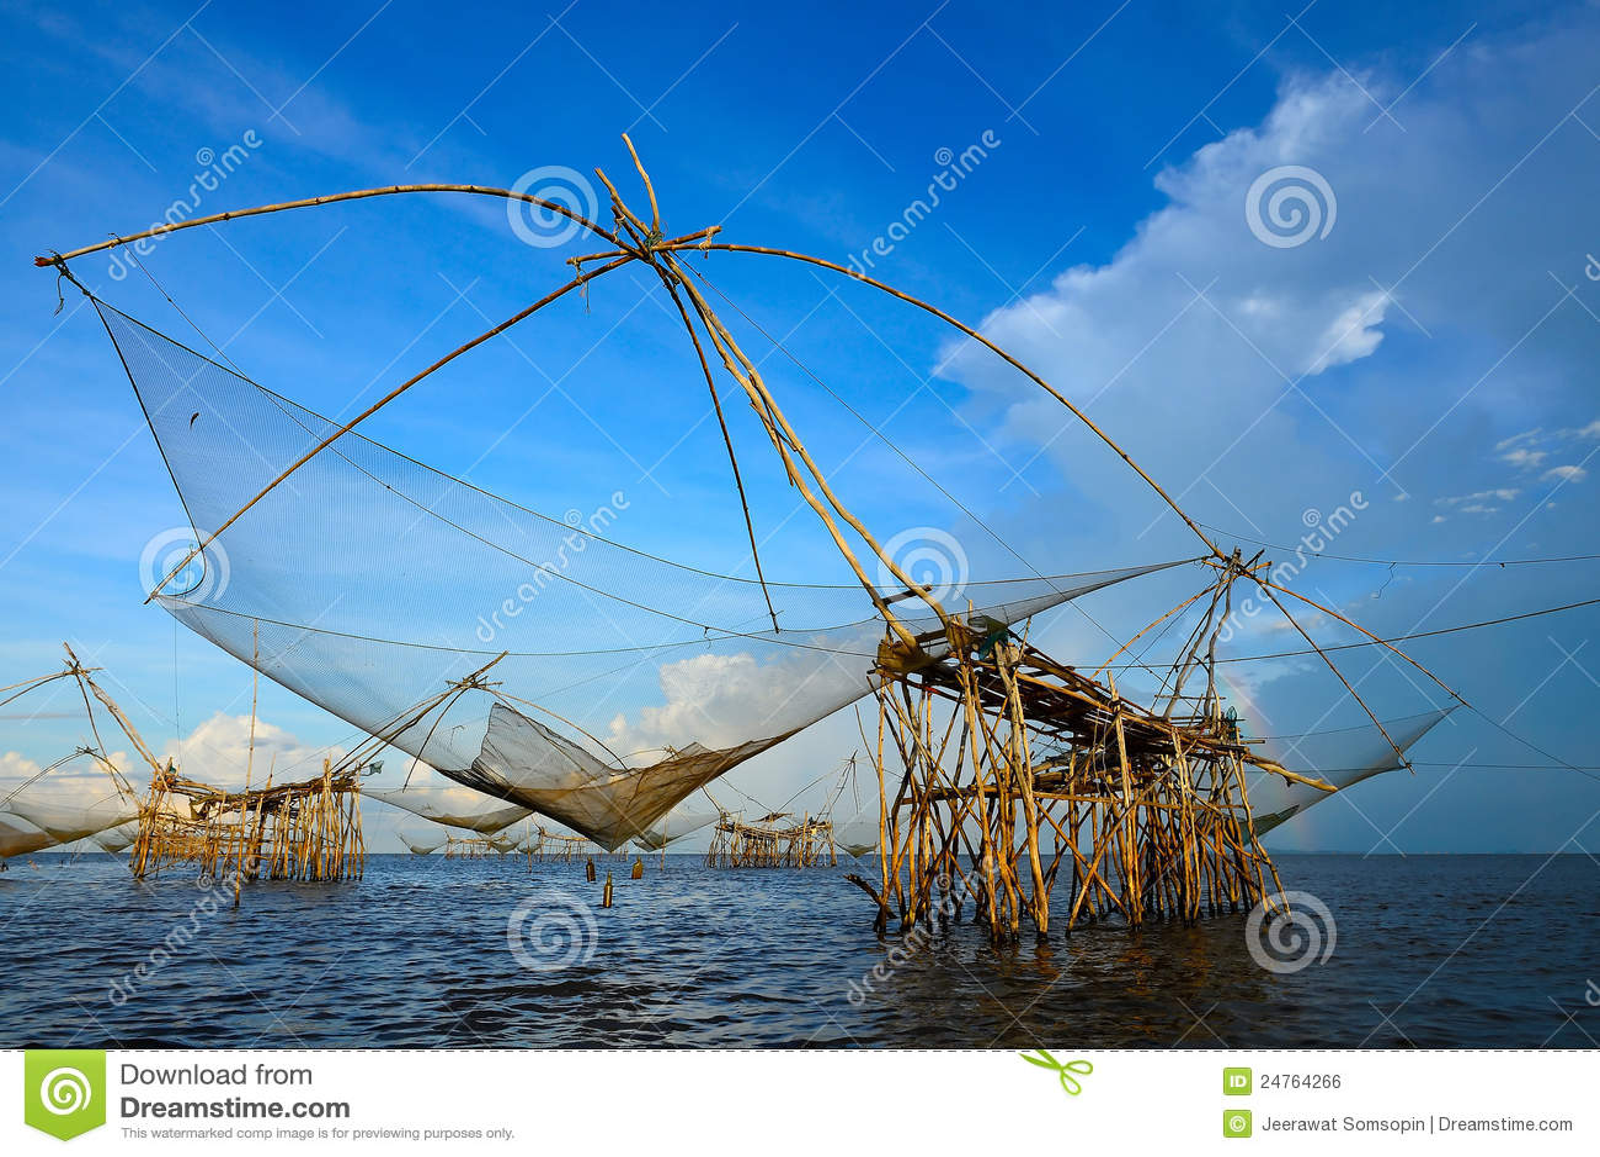 The big fish lift nets royalty free stock image image for Big fishing net